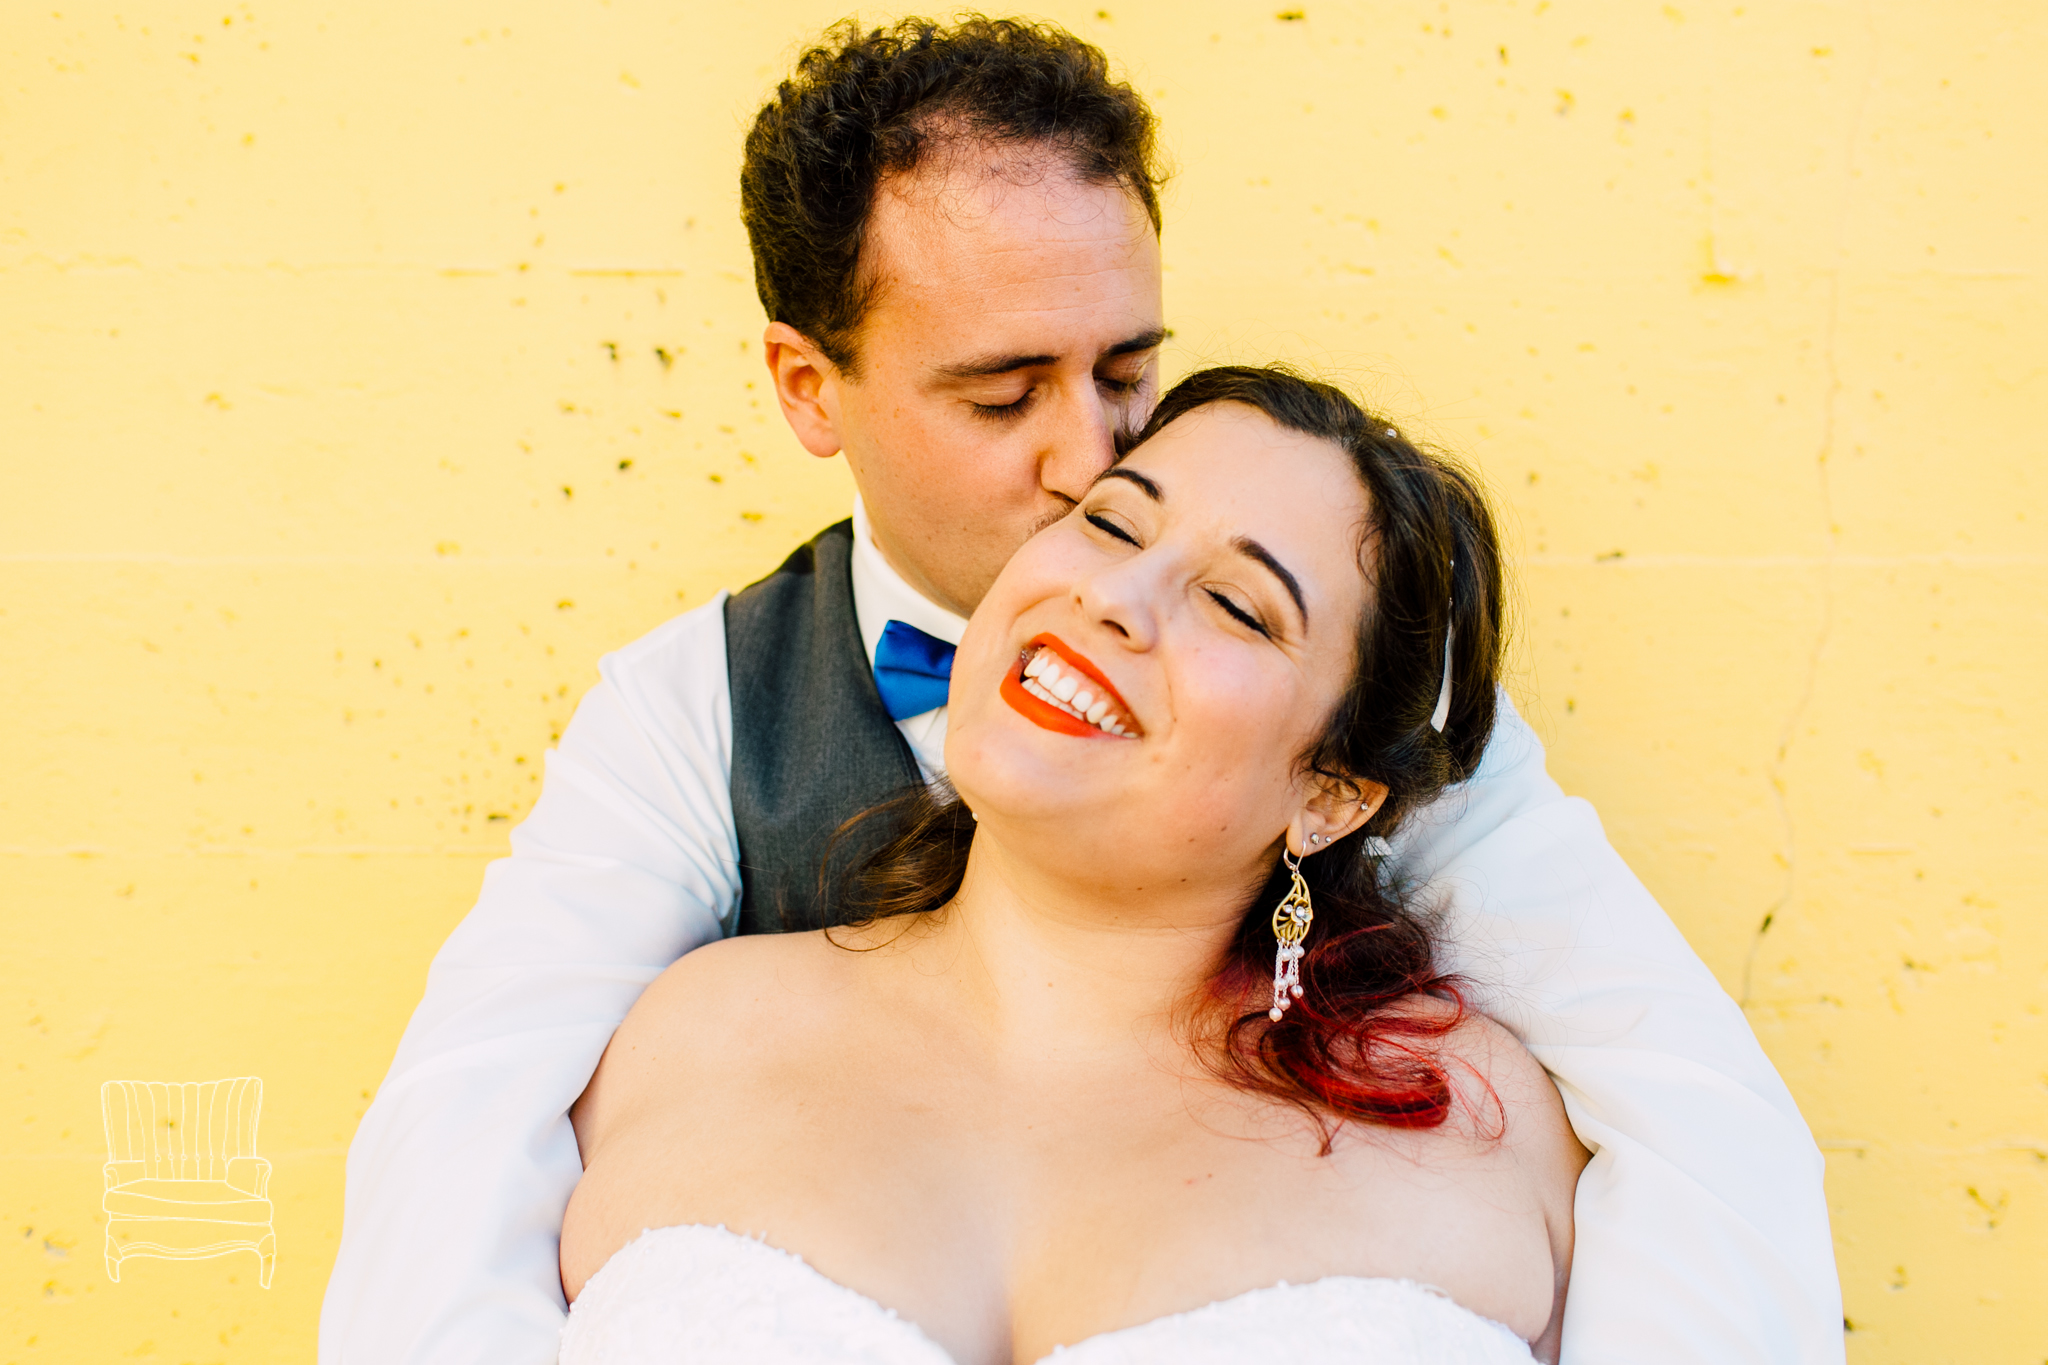 whatcom-museum-wedding-bribran-katheryn-moran-2.jpg